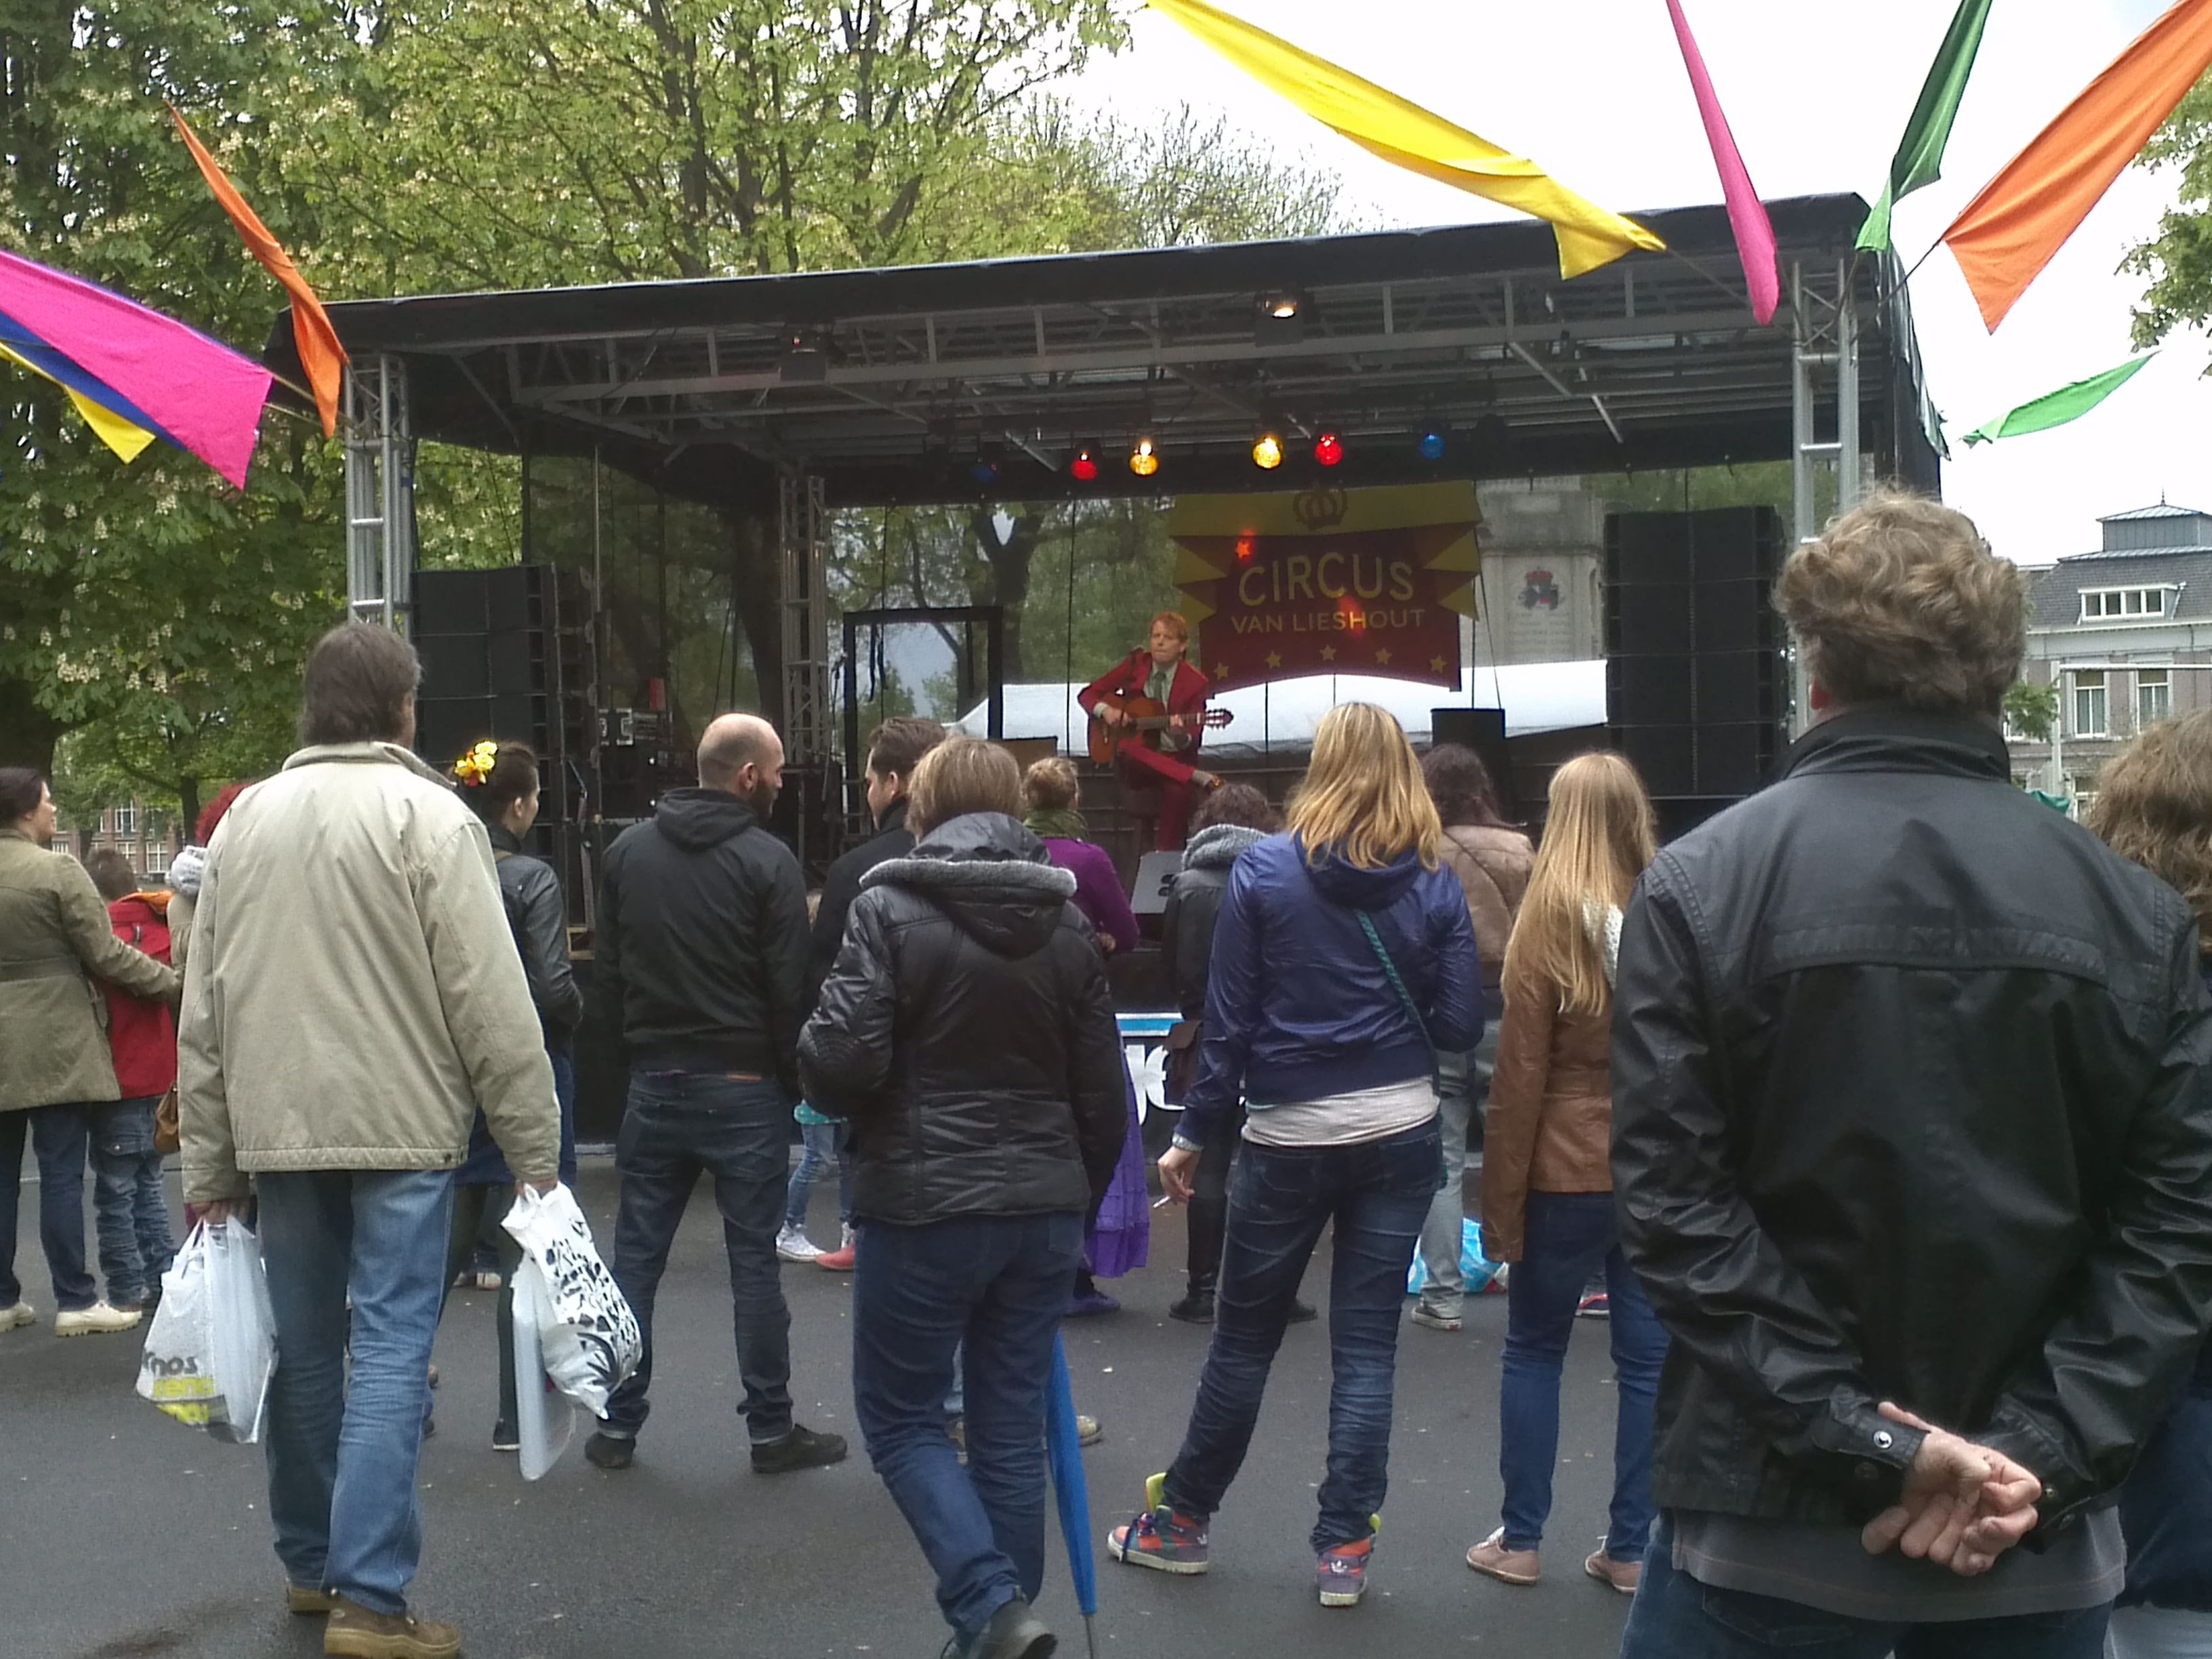 Bevrijdingsfeest Breda 5 mei 2012  Liberation Day Event Breda   In Citypark Valkenberg   Singer/songwriter Leon van den Langenberg